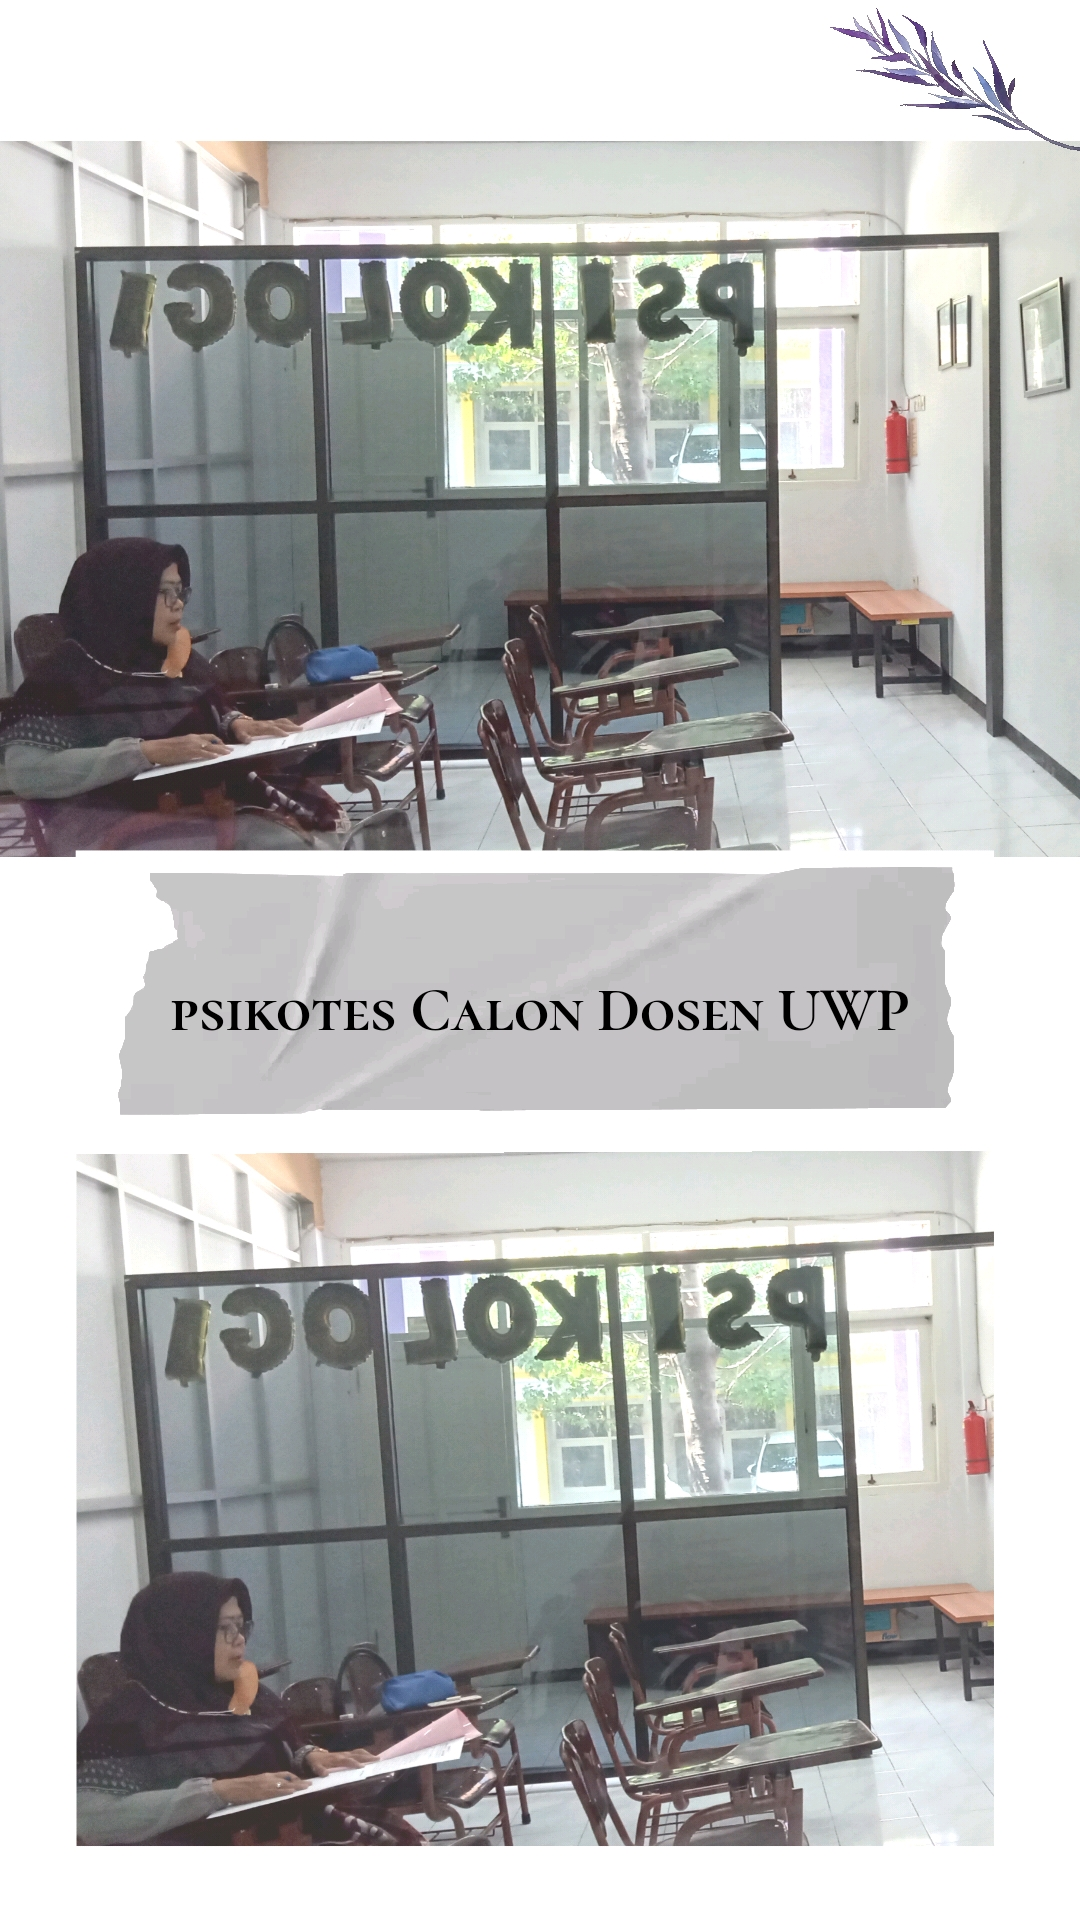 <p>Kamis, 22 April 2021</p><p>Psikotes Calon Dosen UWP</p><p>                                                                                                  </p>